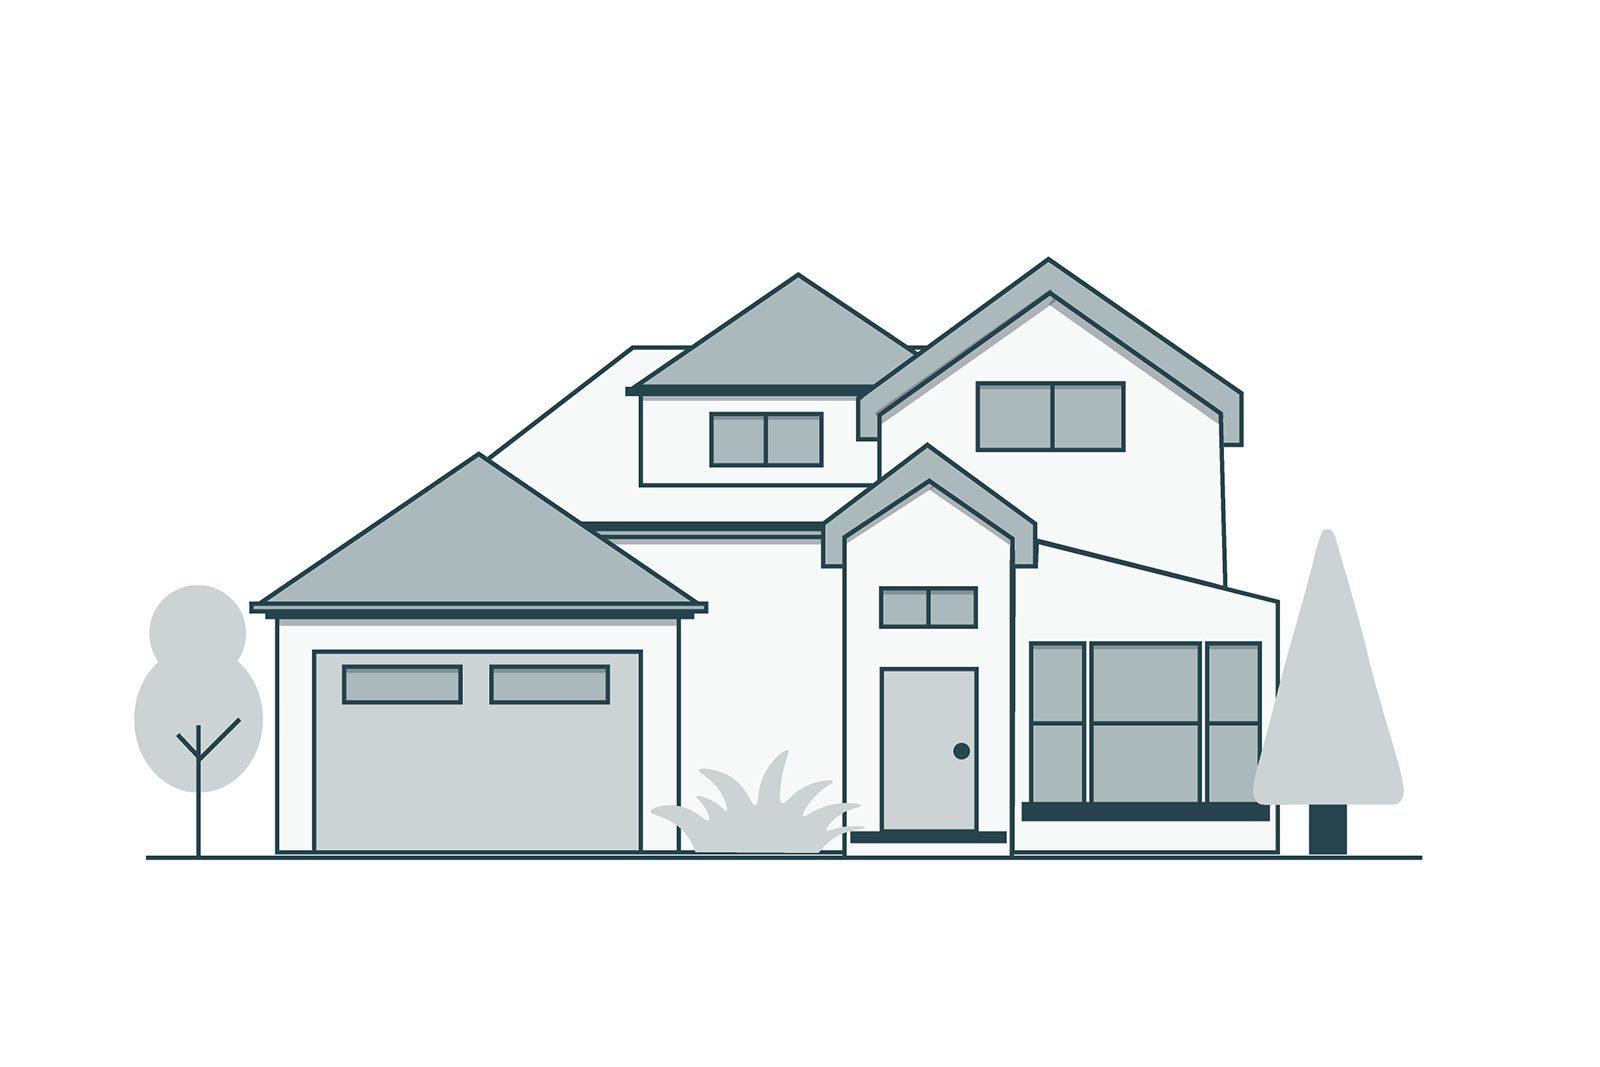 33 Turquoise Way San Francisco, CA 94131